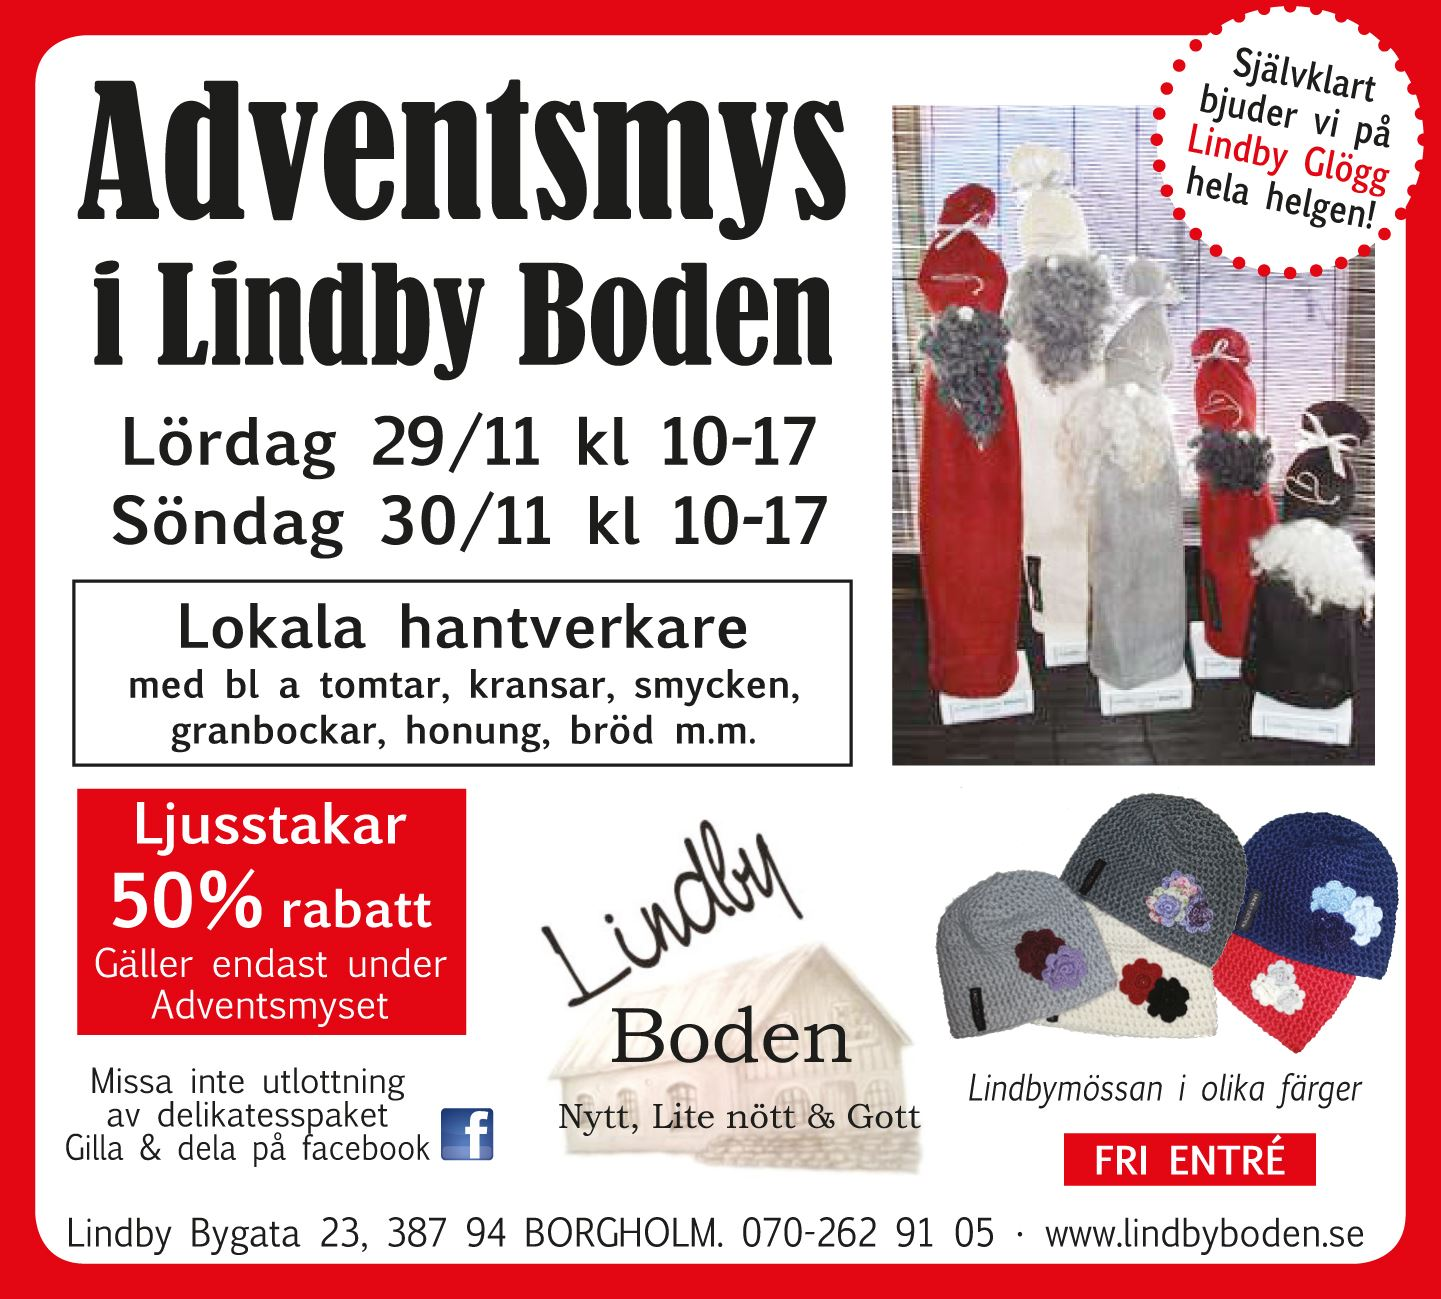 LIndbyboden, Julmys - LindbyBoden